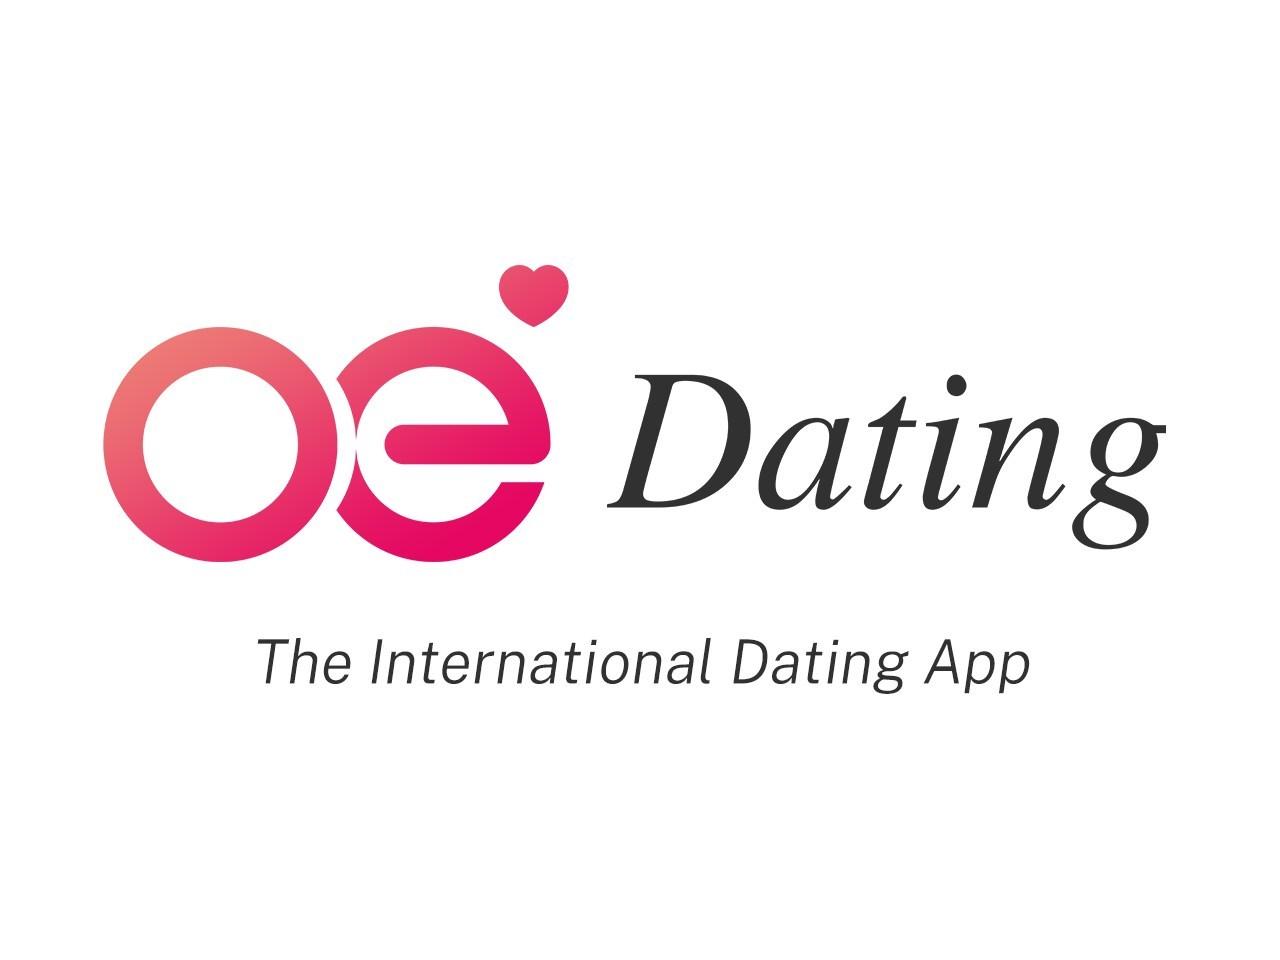 Beijing dating service dating flirt site